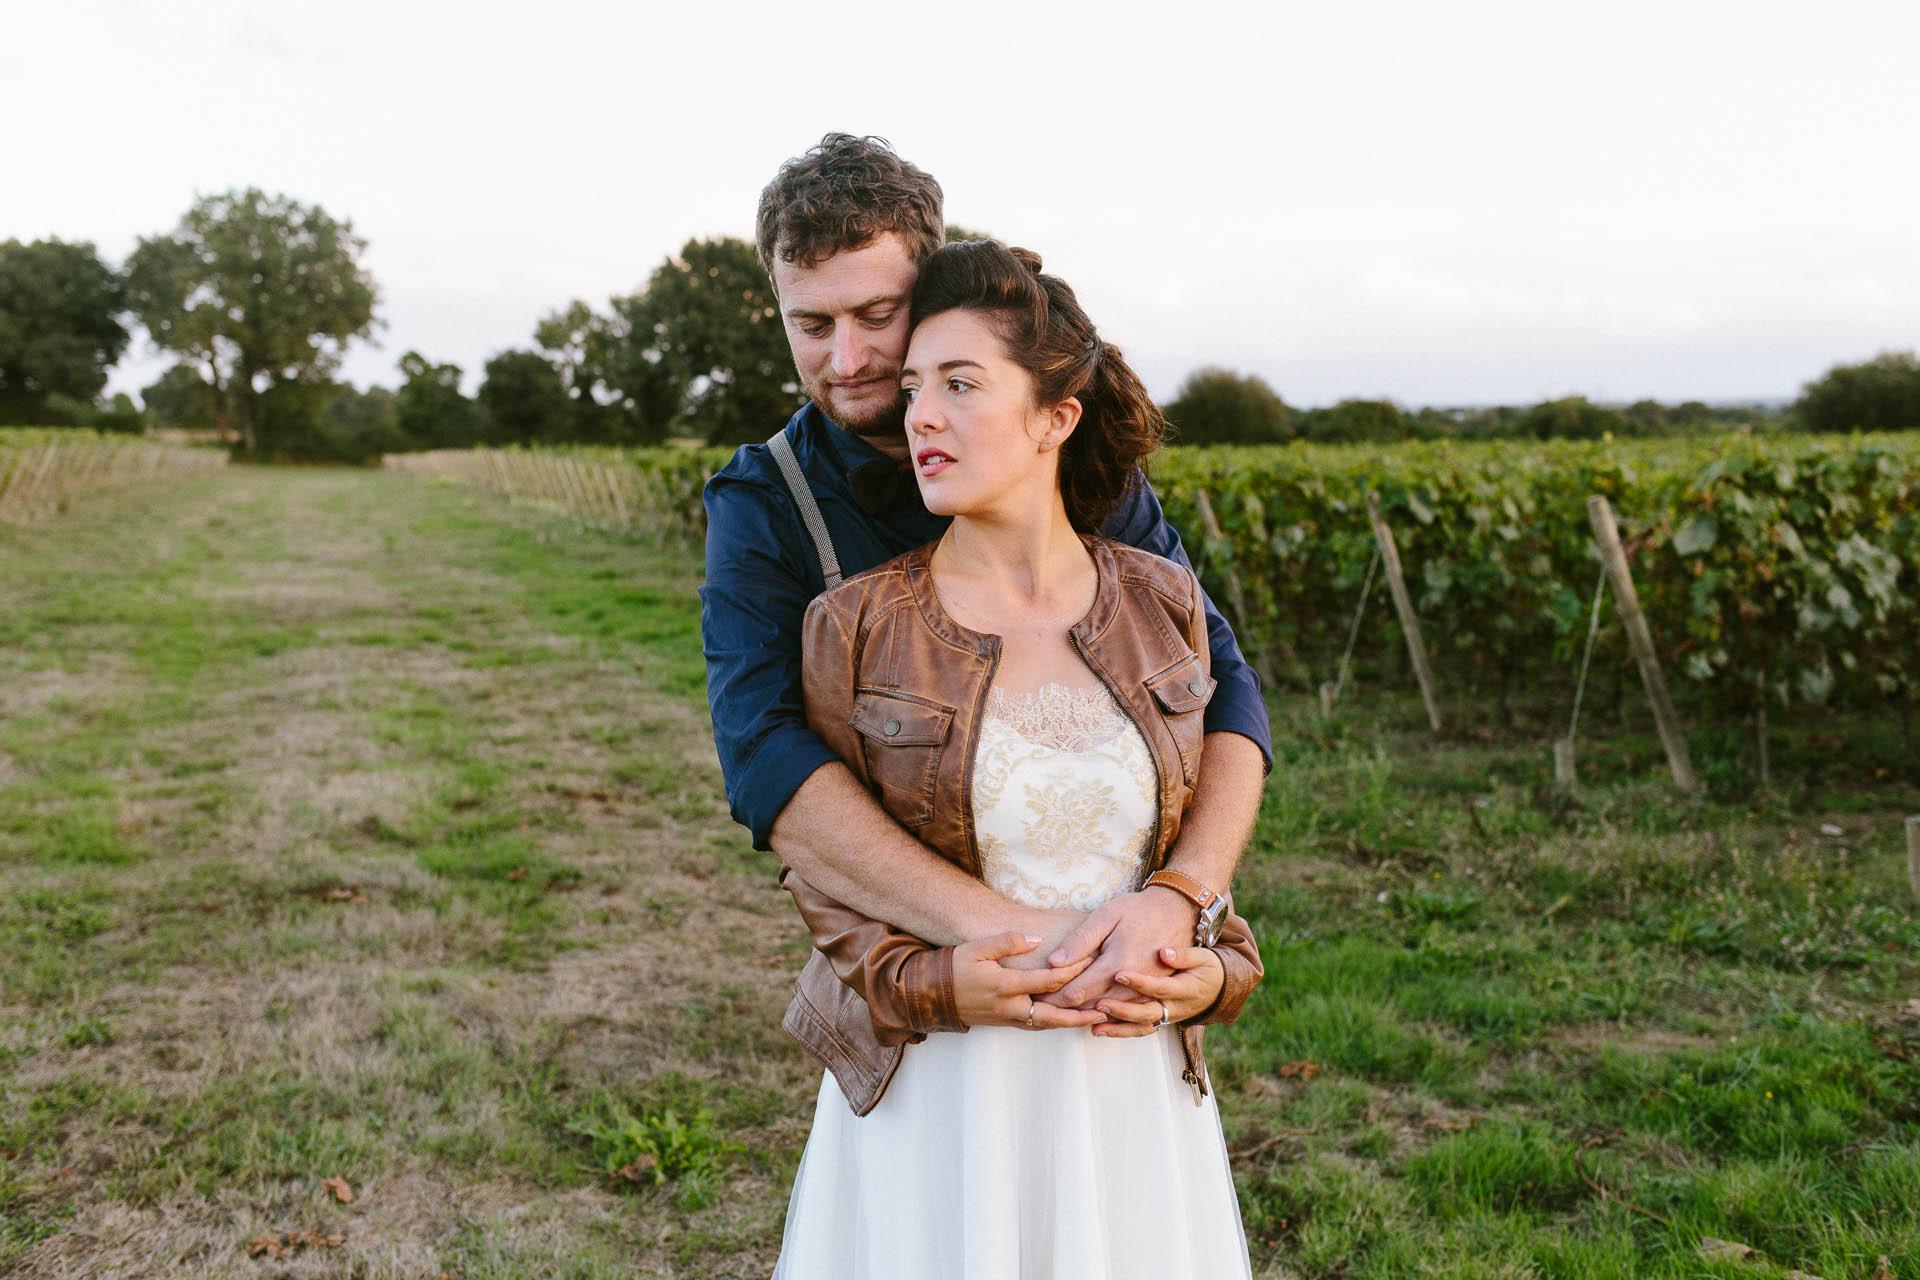 mariage_vignobles_mourat_vendee_jeremy_agathe_flavie_nelly-544